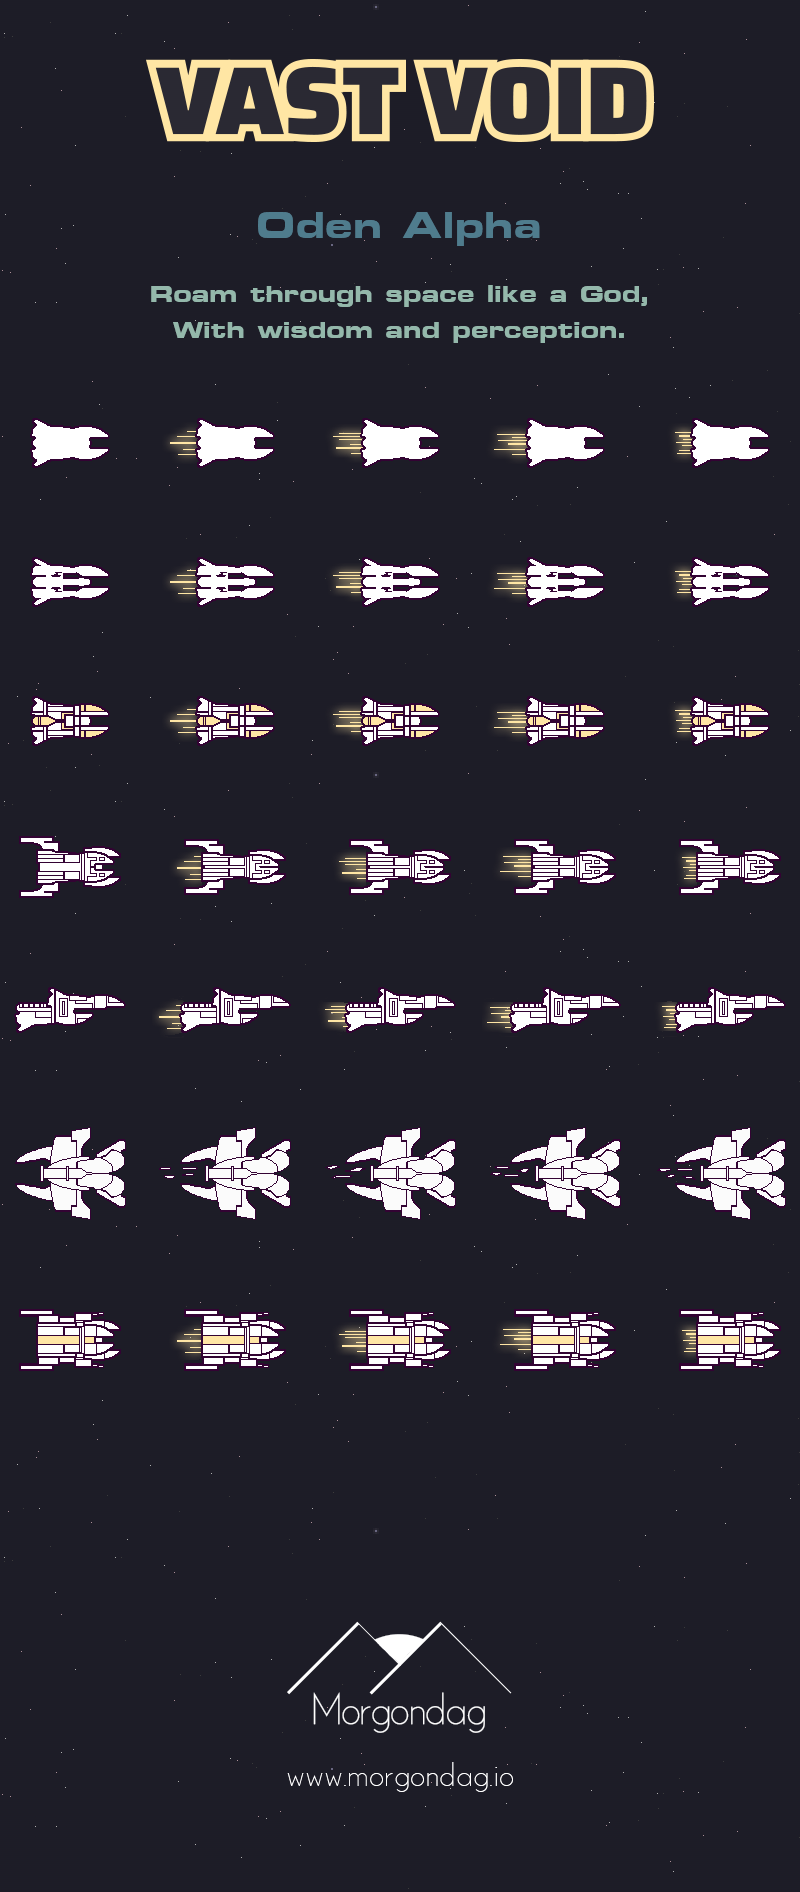 Vast Void - Ships